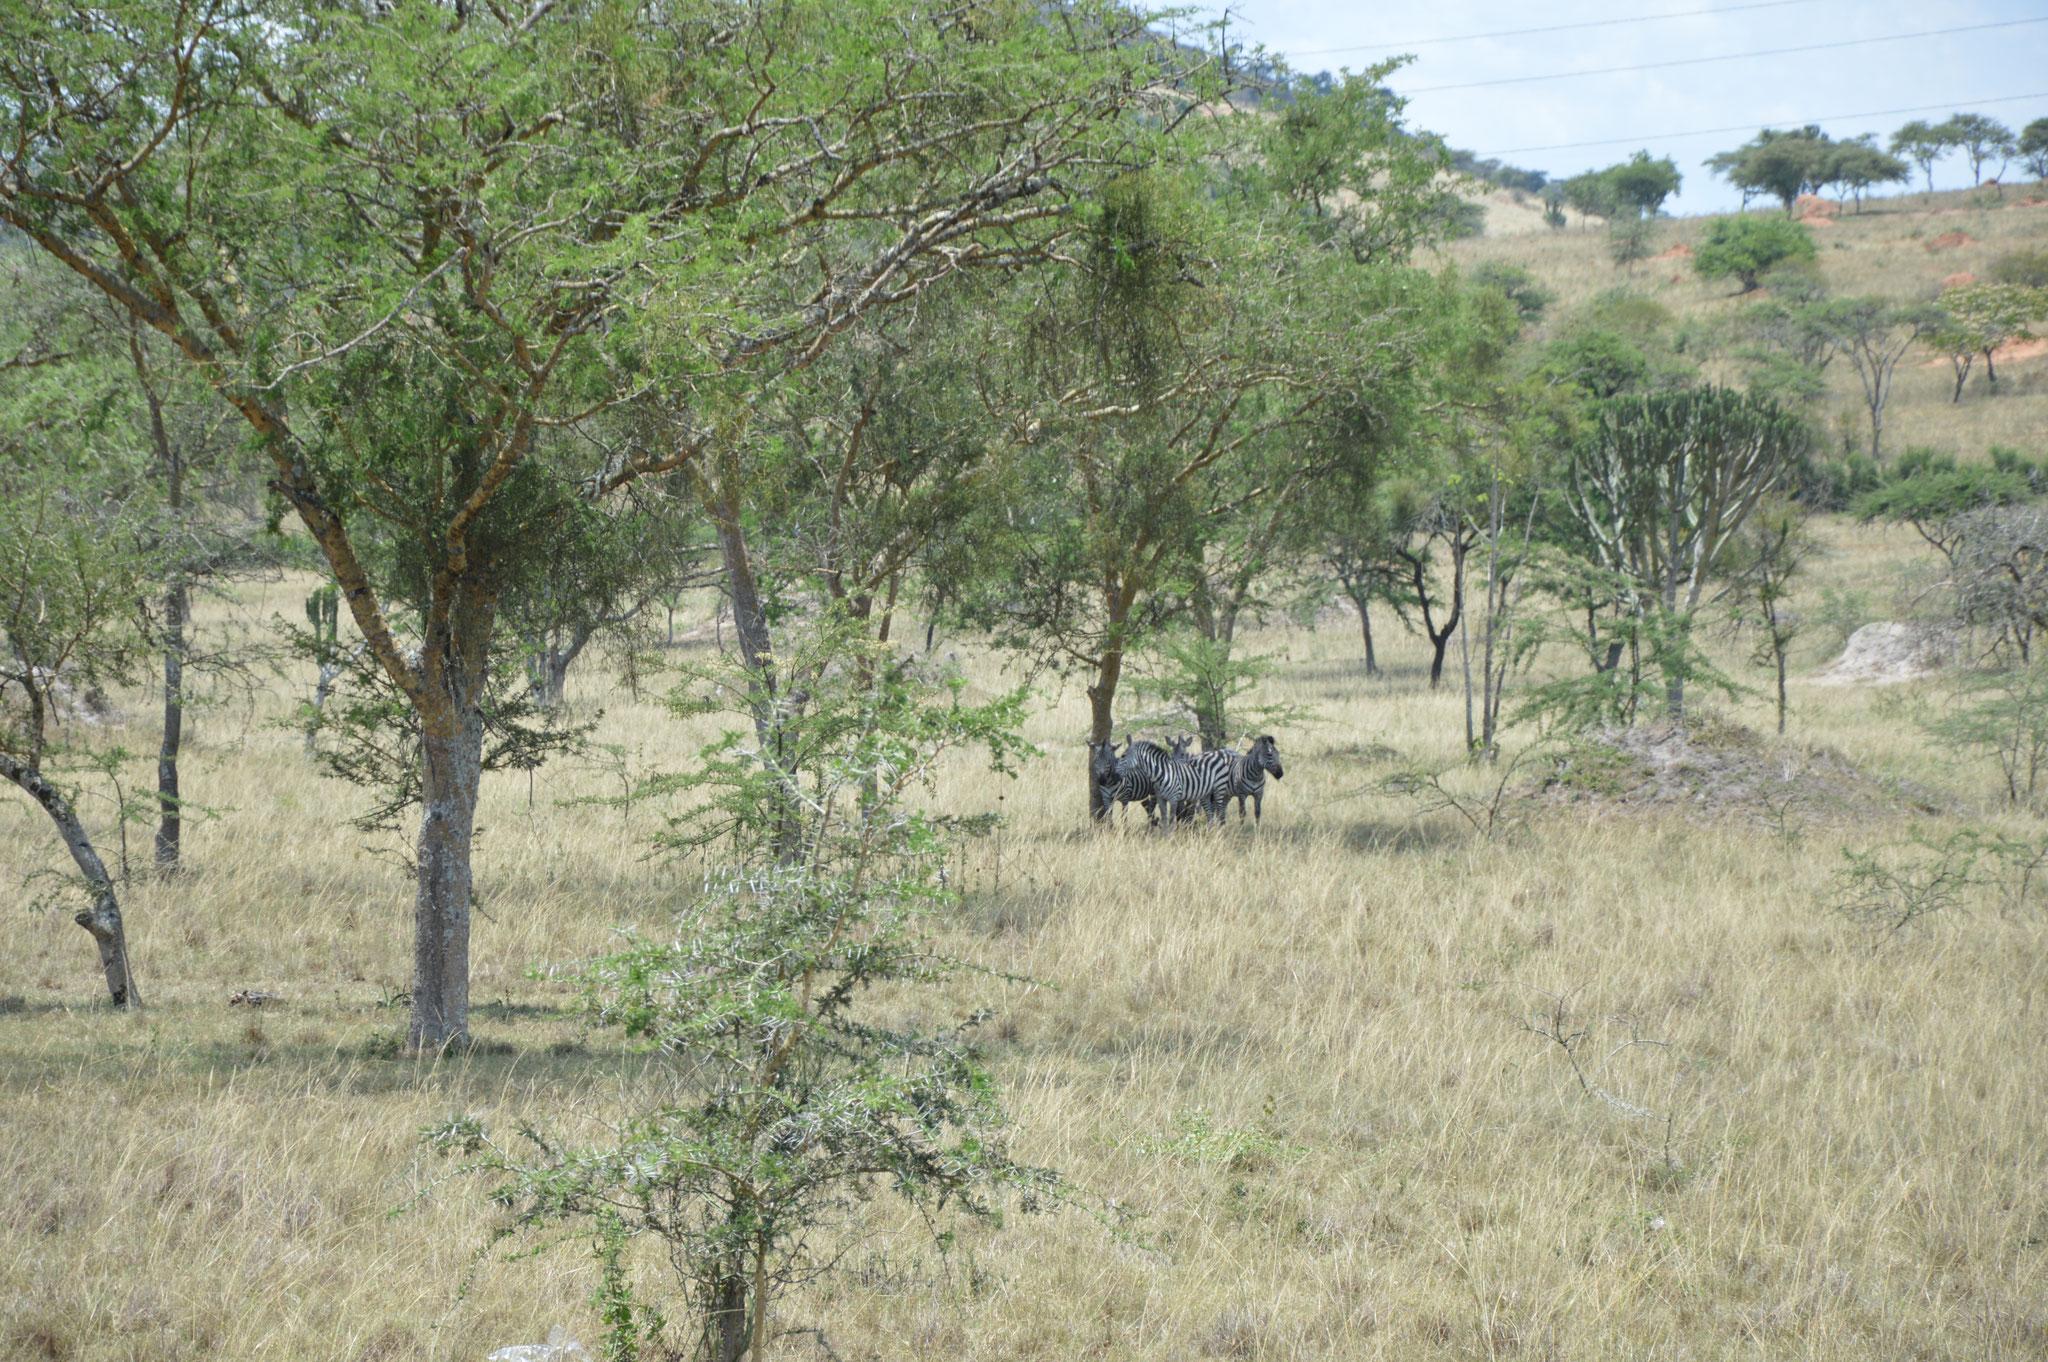 Zebras auf dem Rückweg nach Masaka